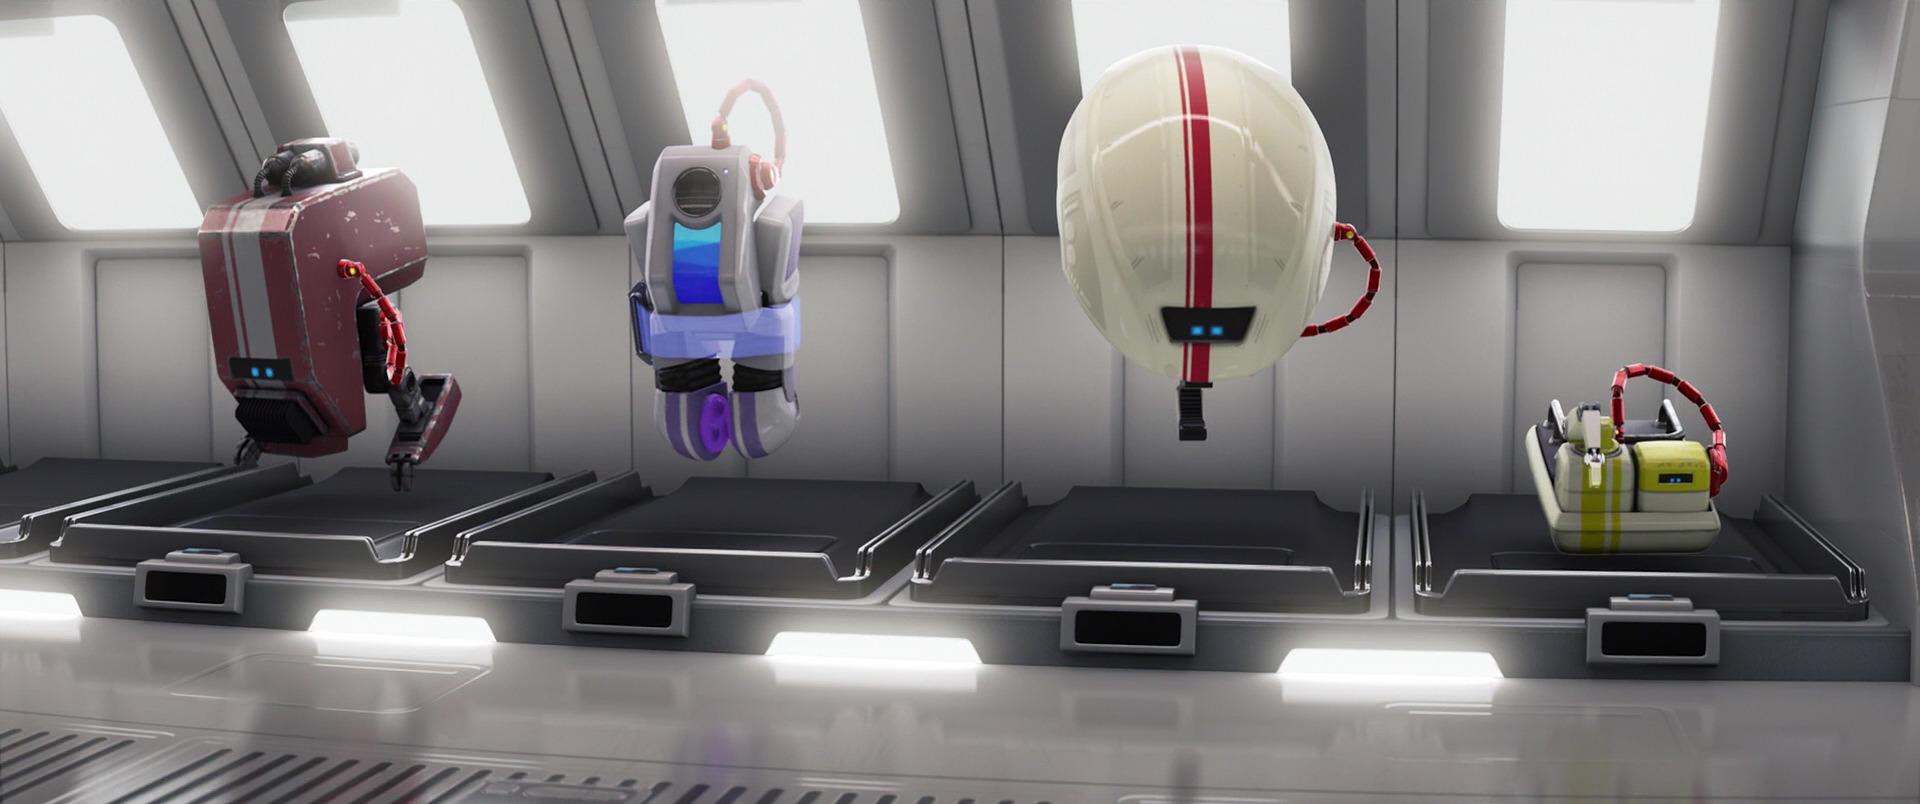 robot transport truck cart pixar disney personnage character wall-e